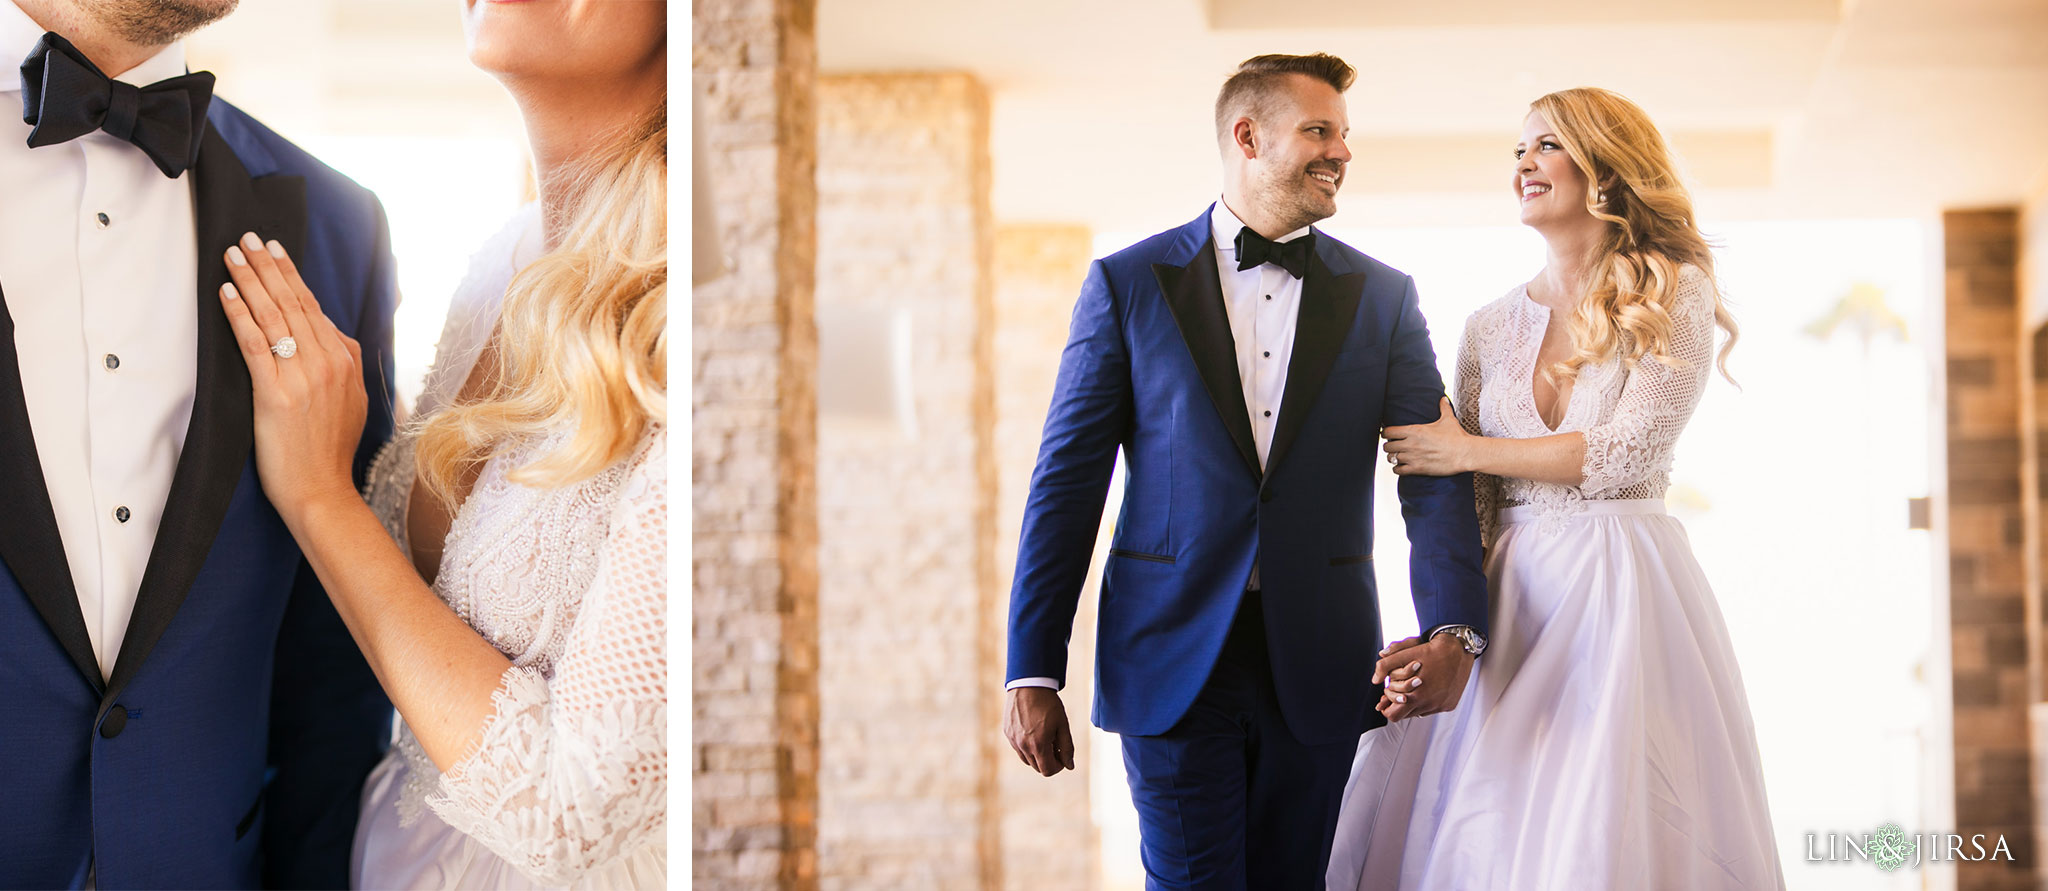 15 pasea hotel huntington beach wedding photography